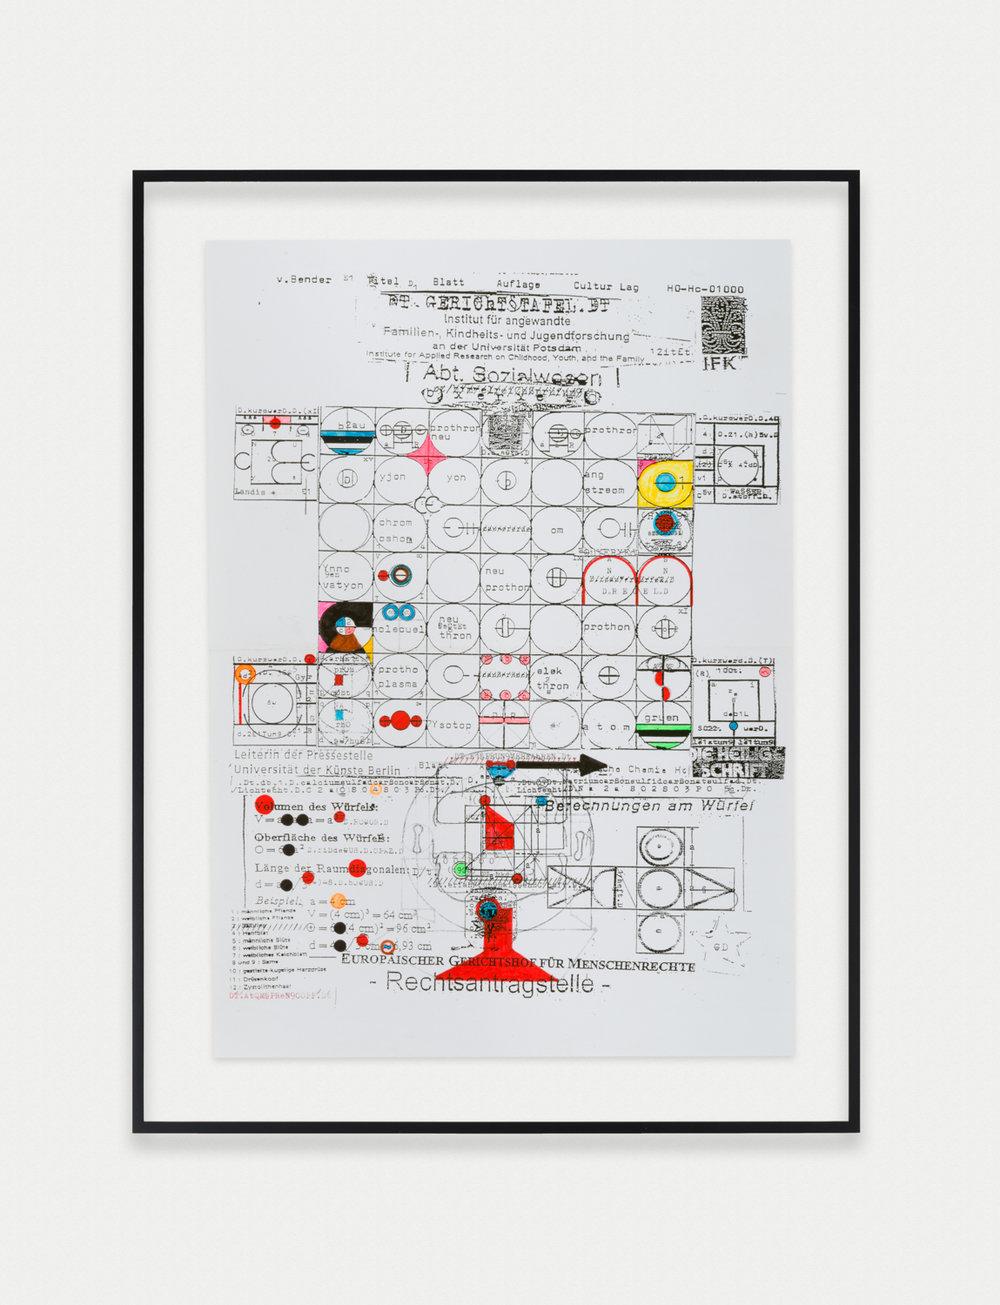 Adelhyd van Bender Untitled 1999-2014 Mixed media on photocopy 16.5 x 11.75 in (41.91h x 29.85w cm) AVB023